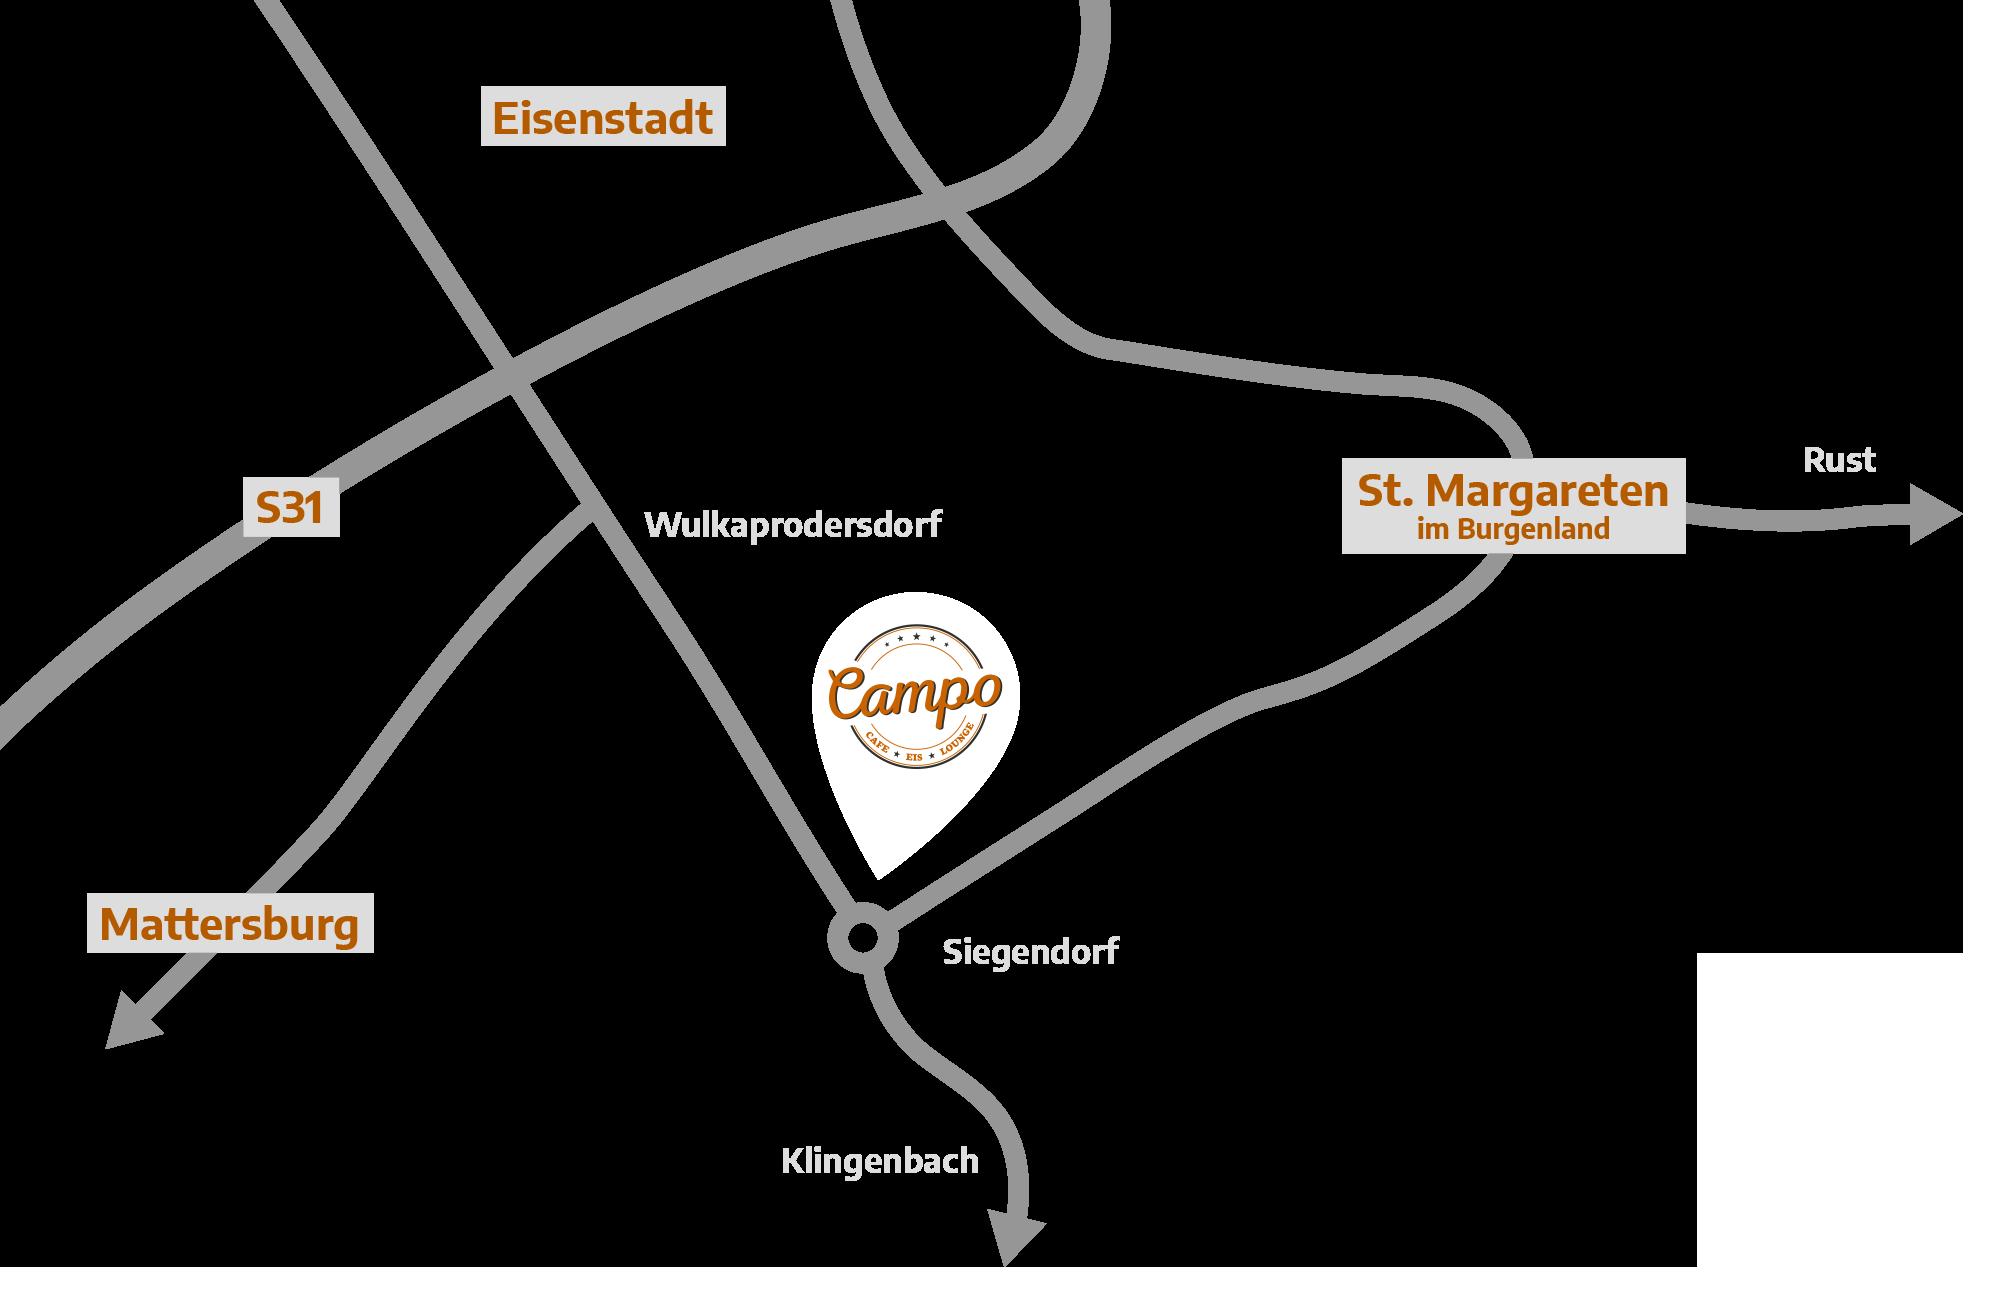 Campo in Siegendorf